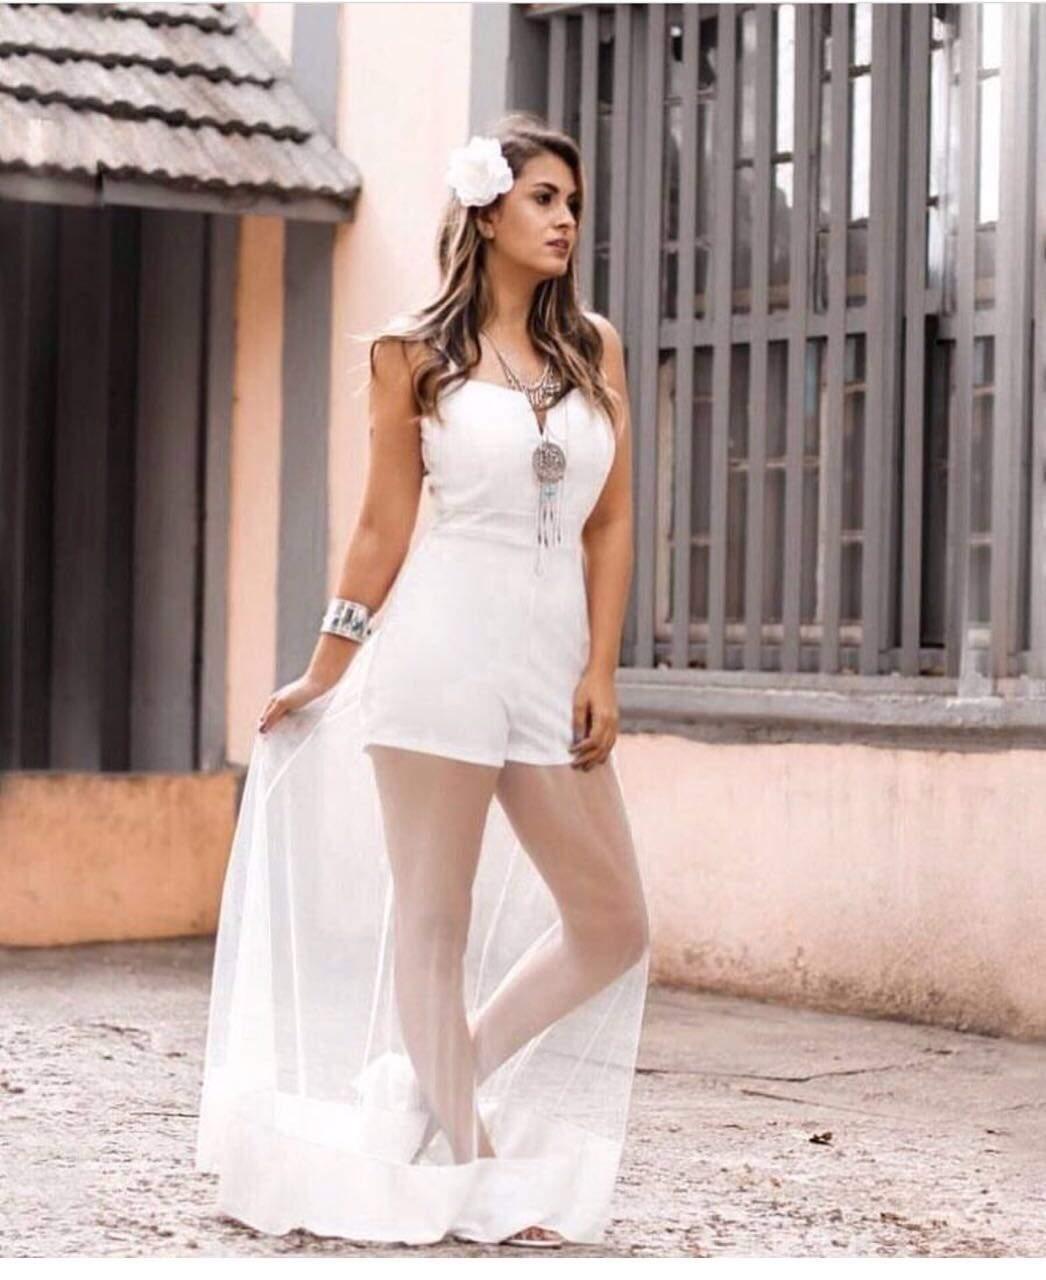 1bc3ee2b2 Vestido com macaquinho longo em tule - Mon Cherri Moda Feminina